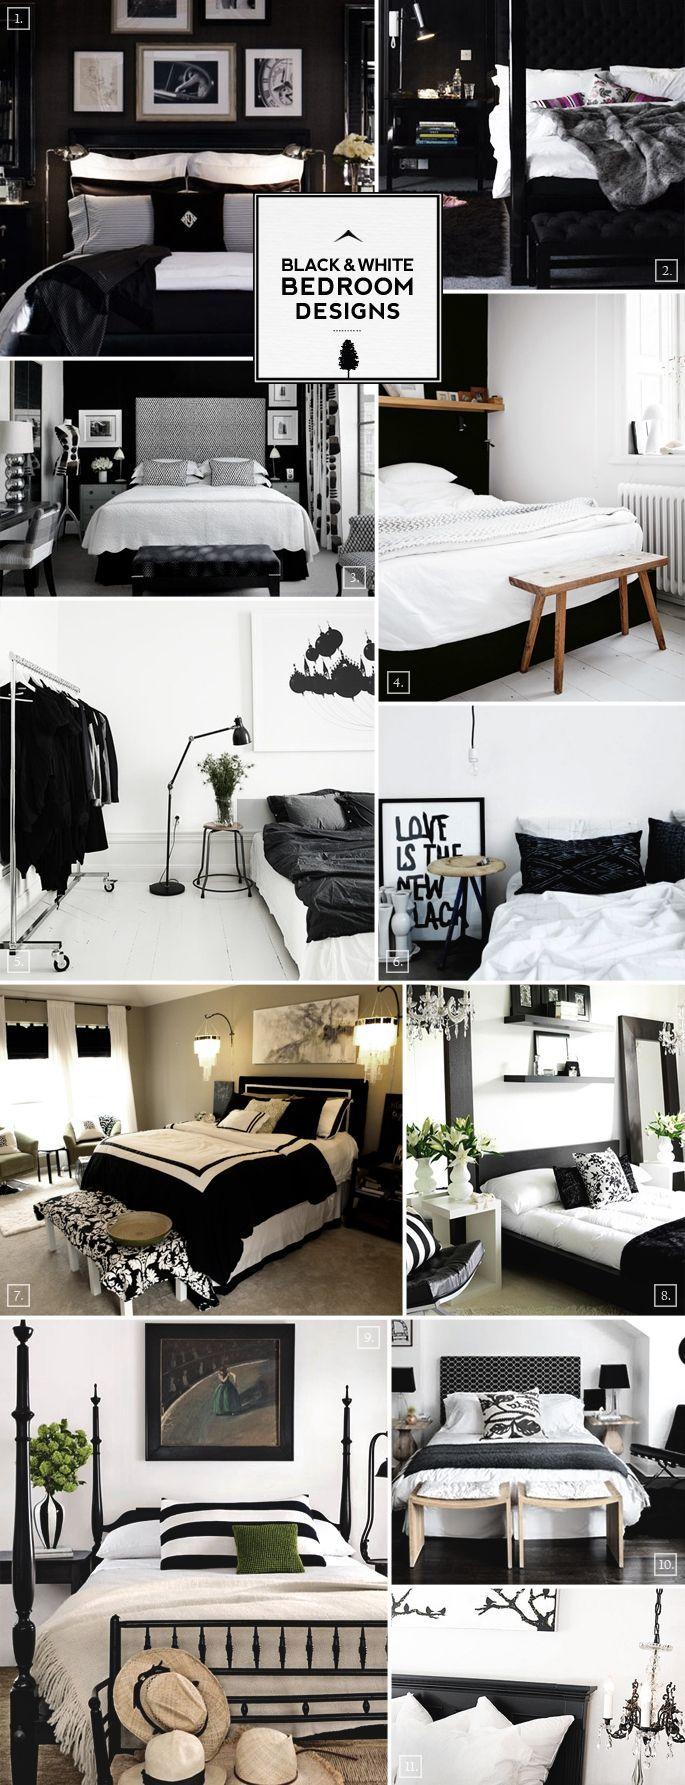 Bedrooms: Black U0026 White Images On Pinterest   Bedroom Black, Masculine  Bedrooms And Master Bedrooms